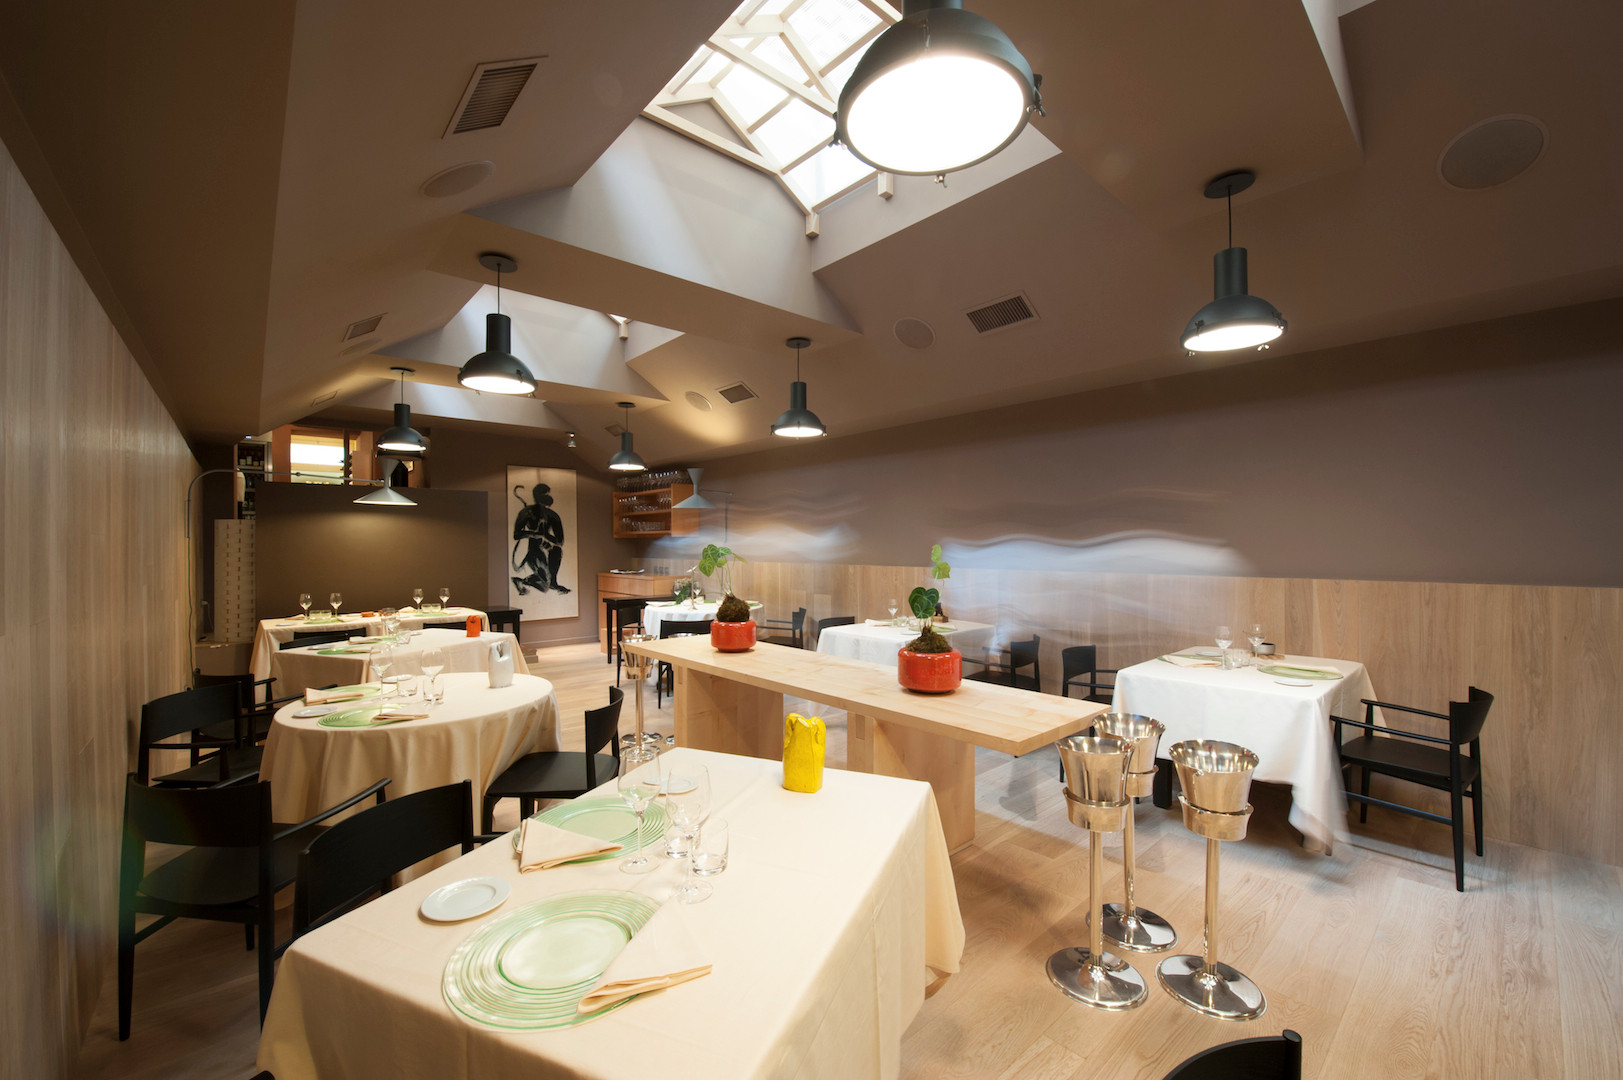 Veganday 10 ristoranti per vegani in italia - Ristorante borgo antico cucine da incubo ...